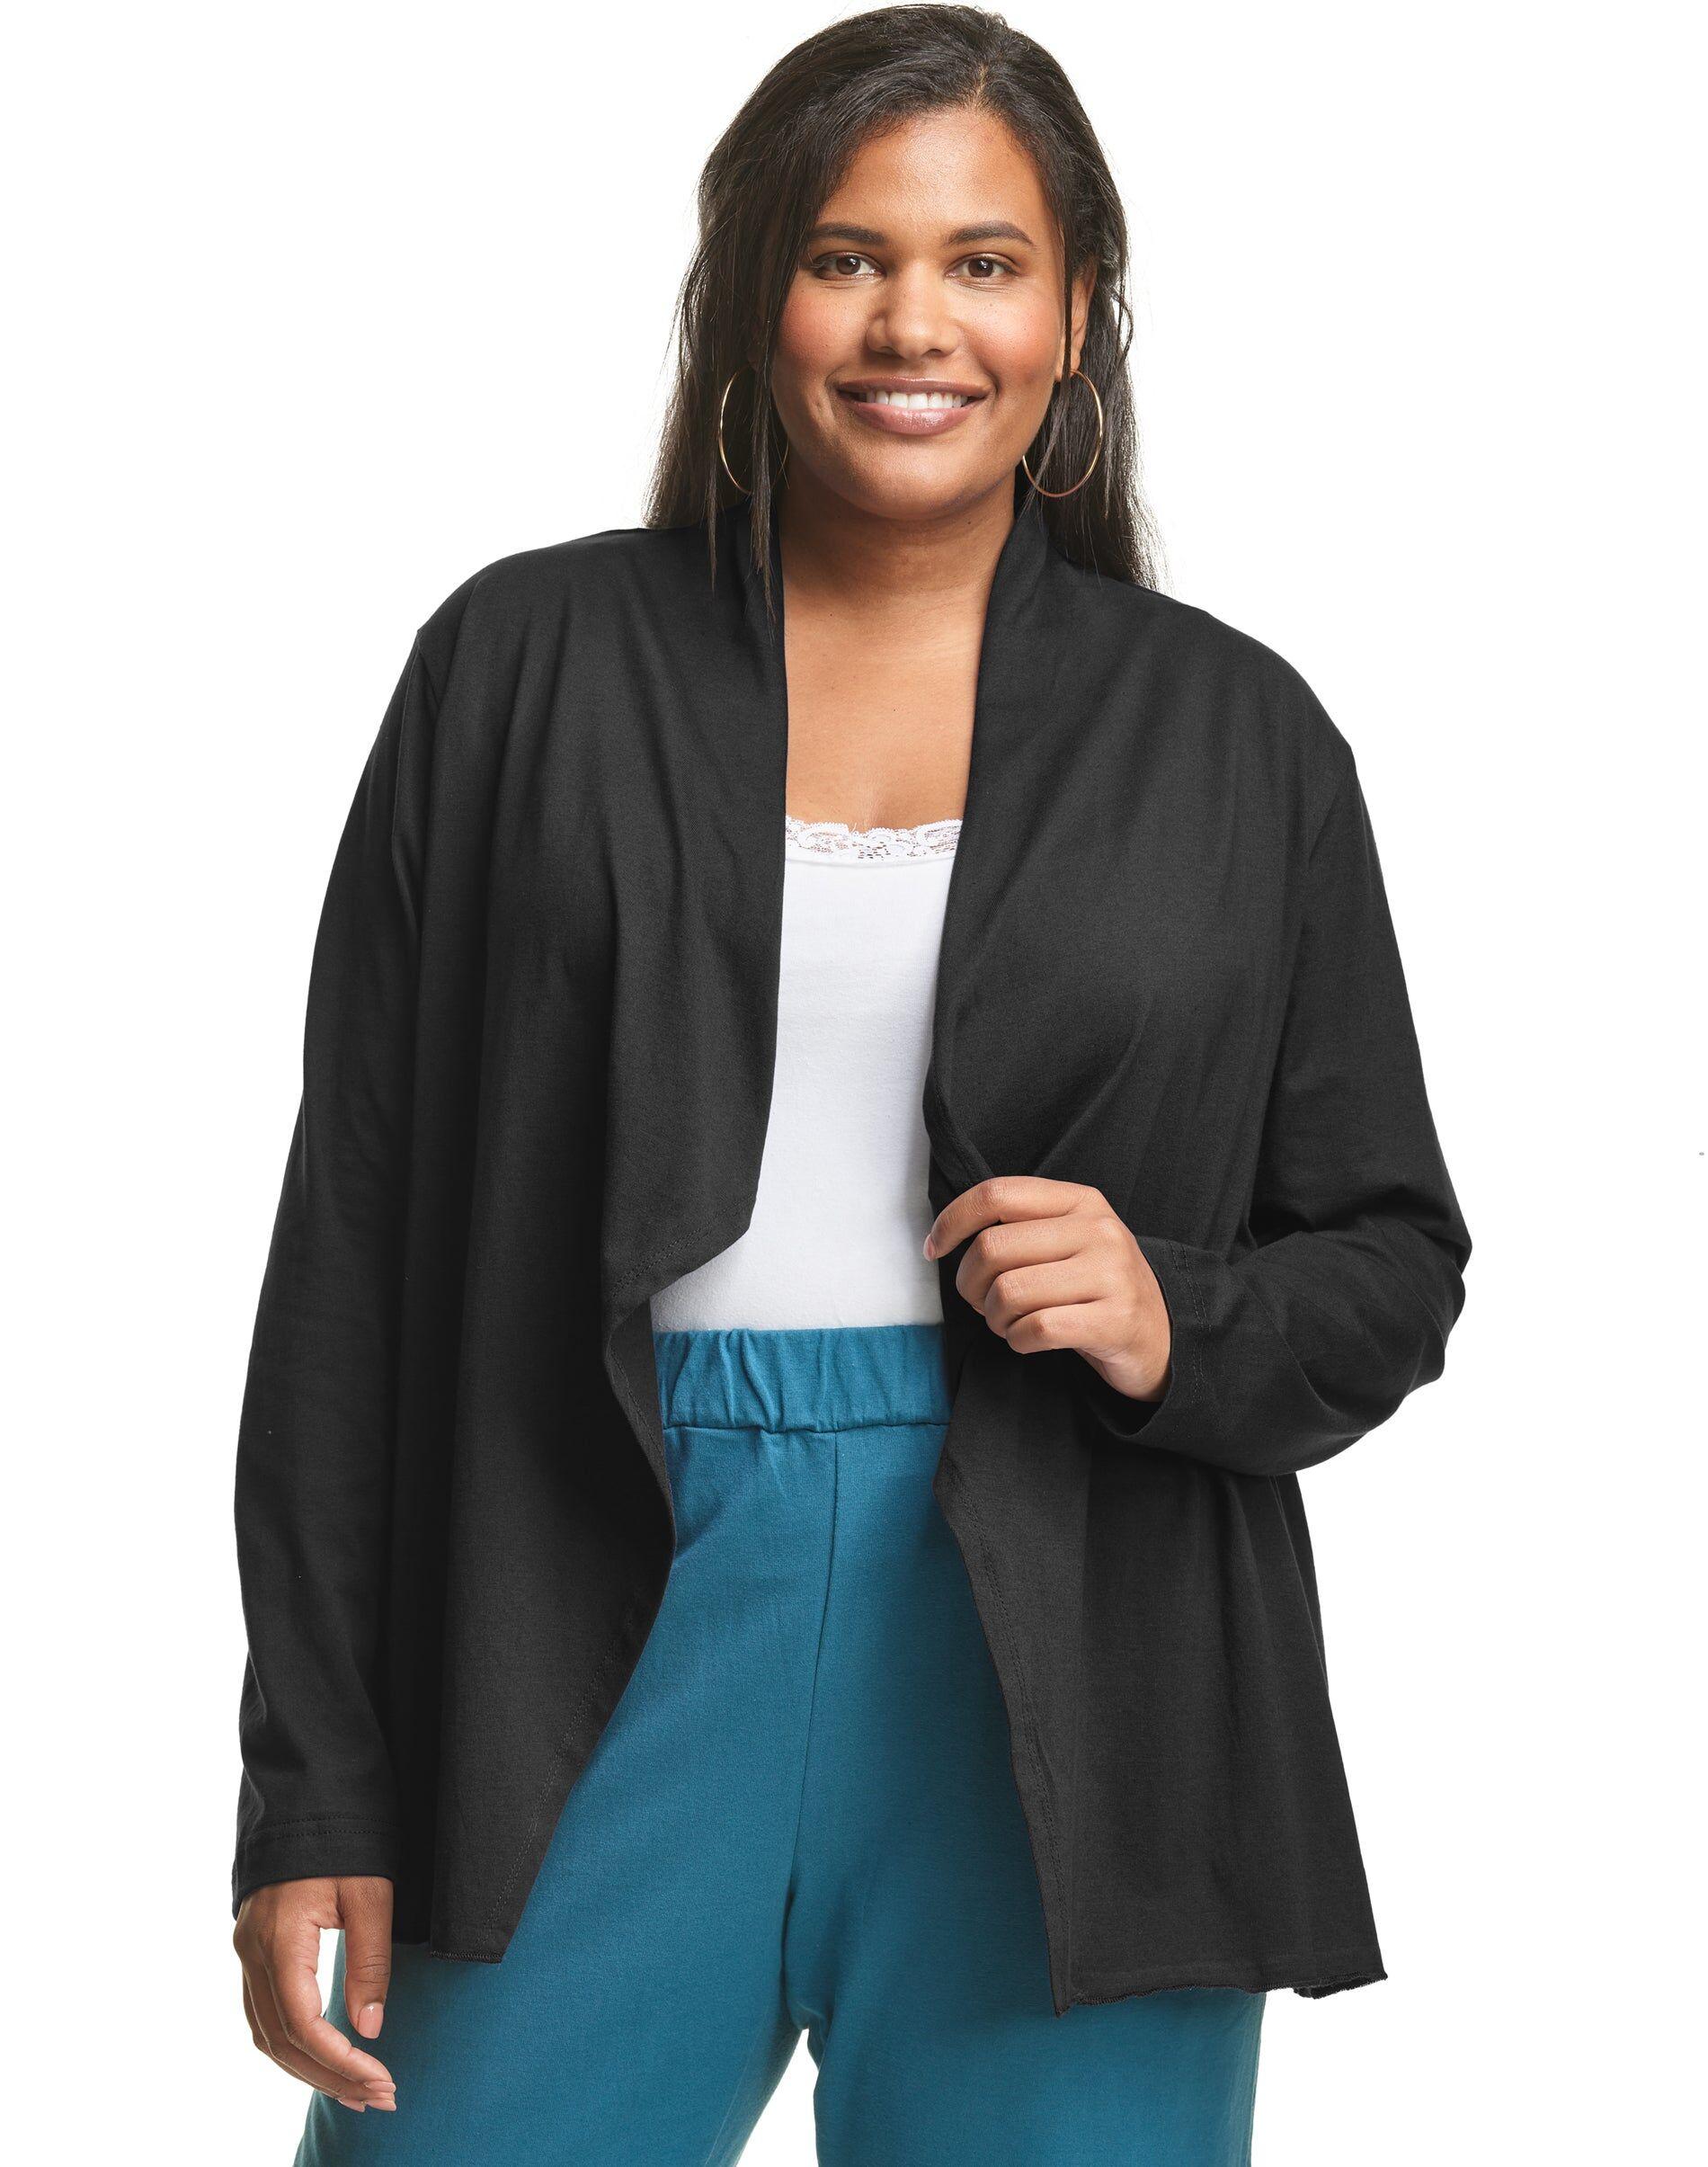 Just My Size Jersey Matchables Swing Cardigan Black 4X Women's